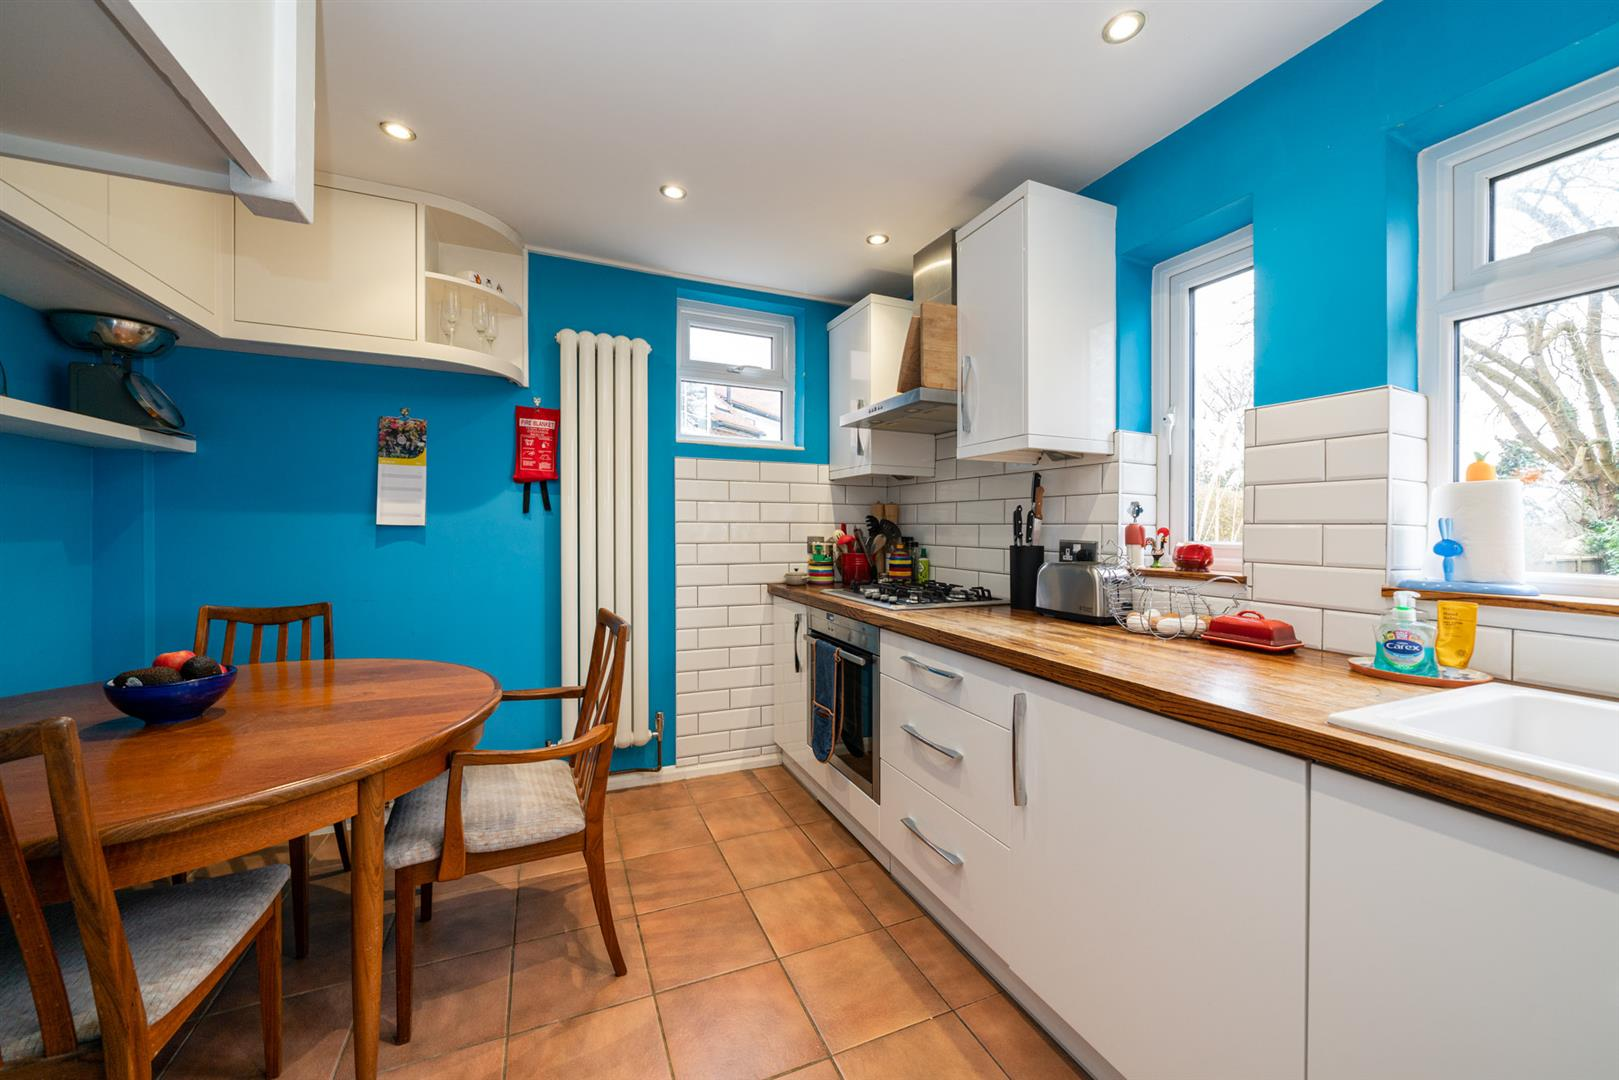 Flat-6-Ruscoe-2 - kitchen.jpg